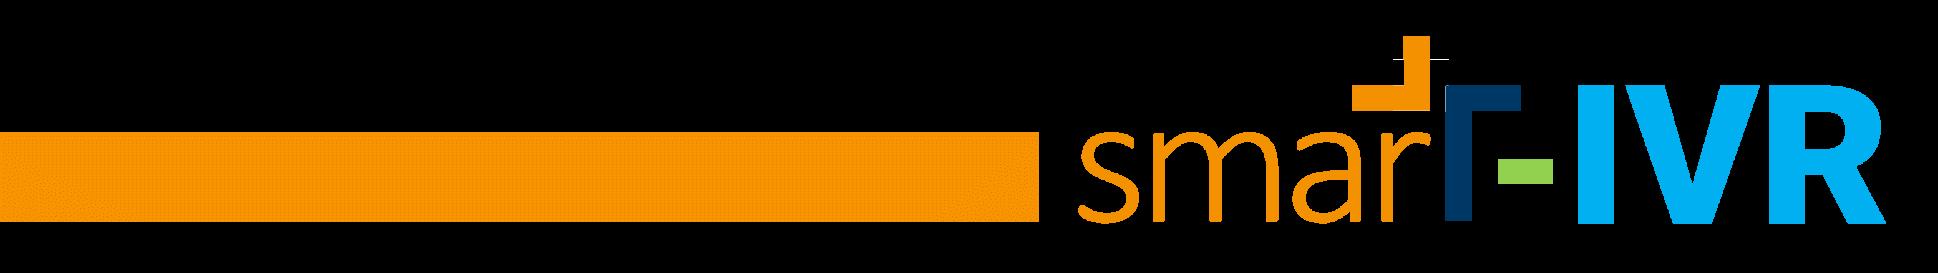 smart-IVR